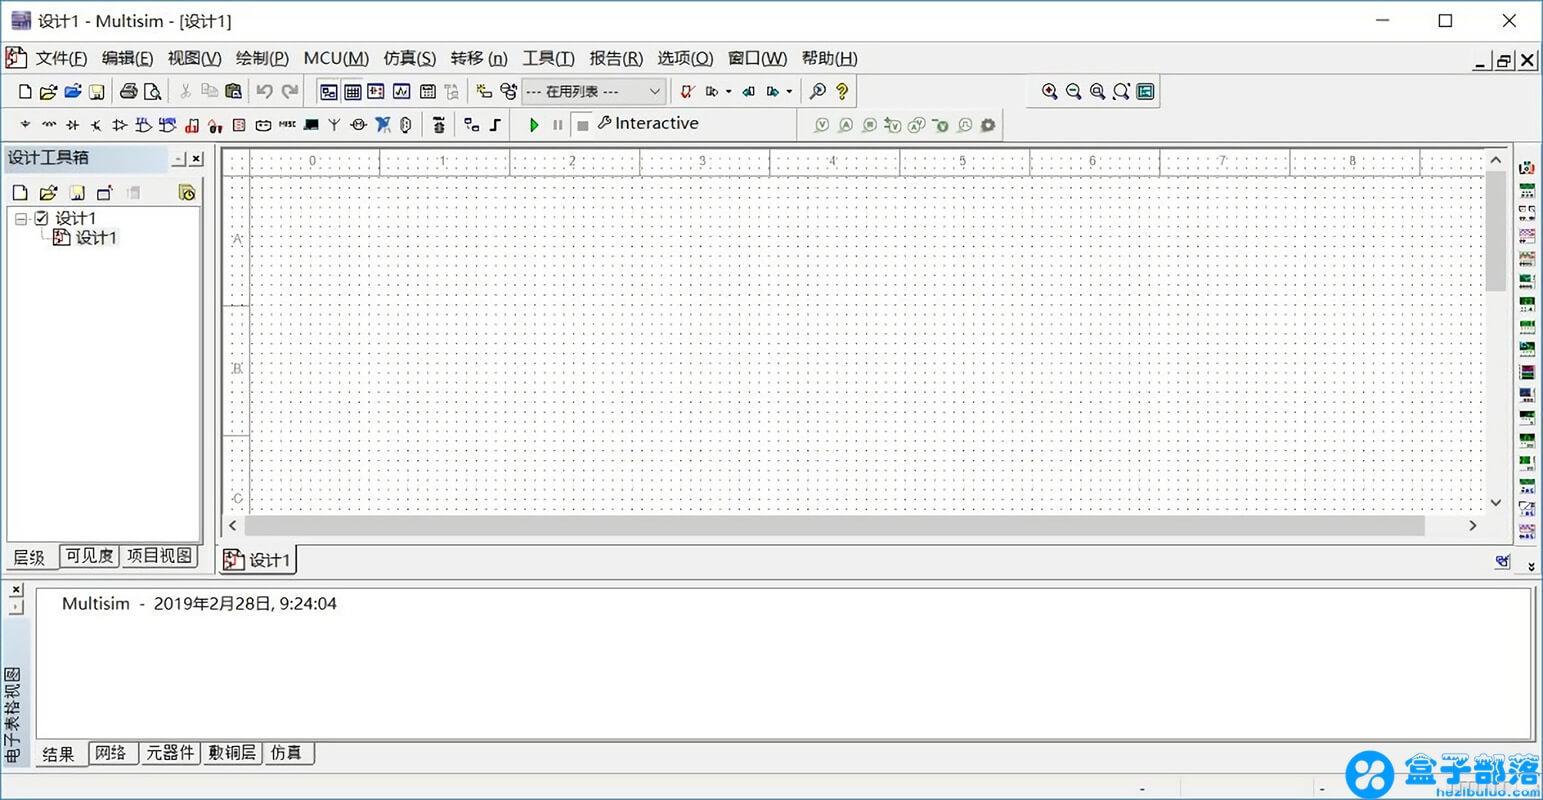 Multisim 14.0 电路功能测试虚拟仿真软件